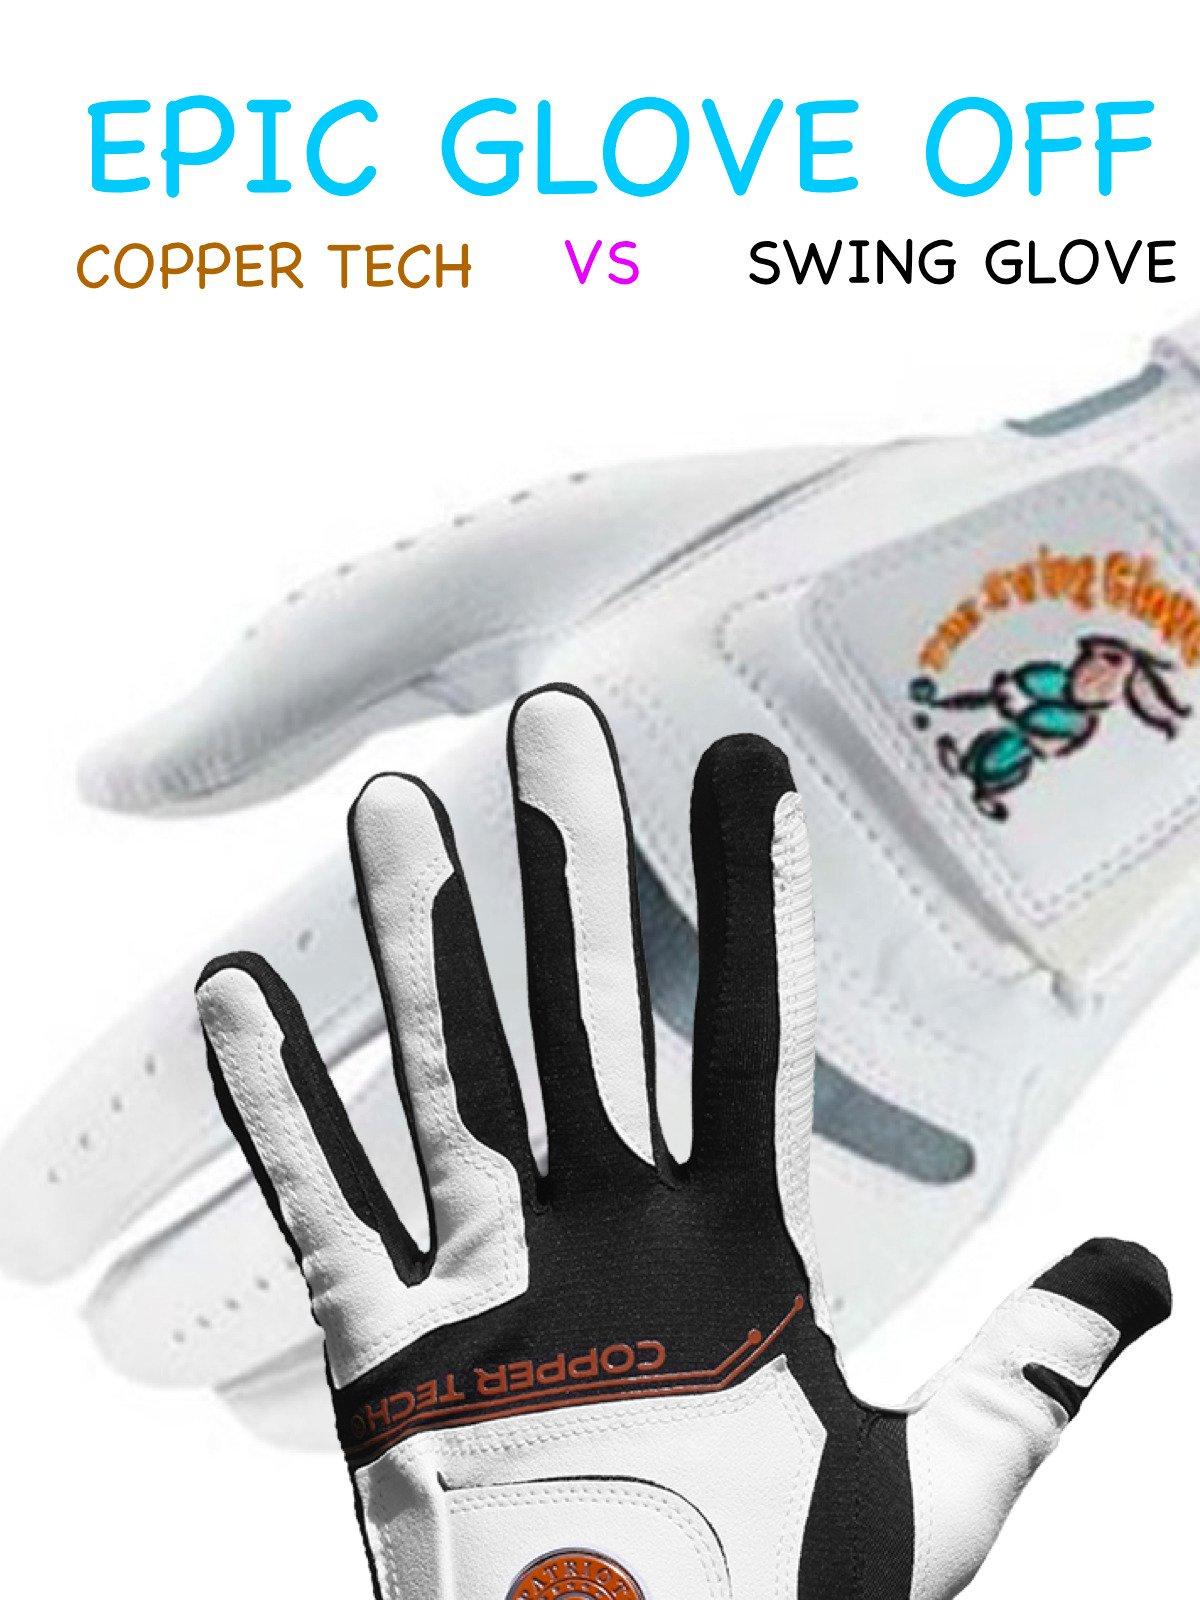 Review: Epic Glove Off: Copper Tech vs Swing Glove